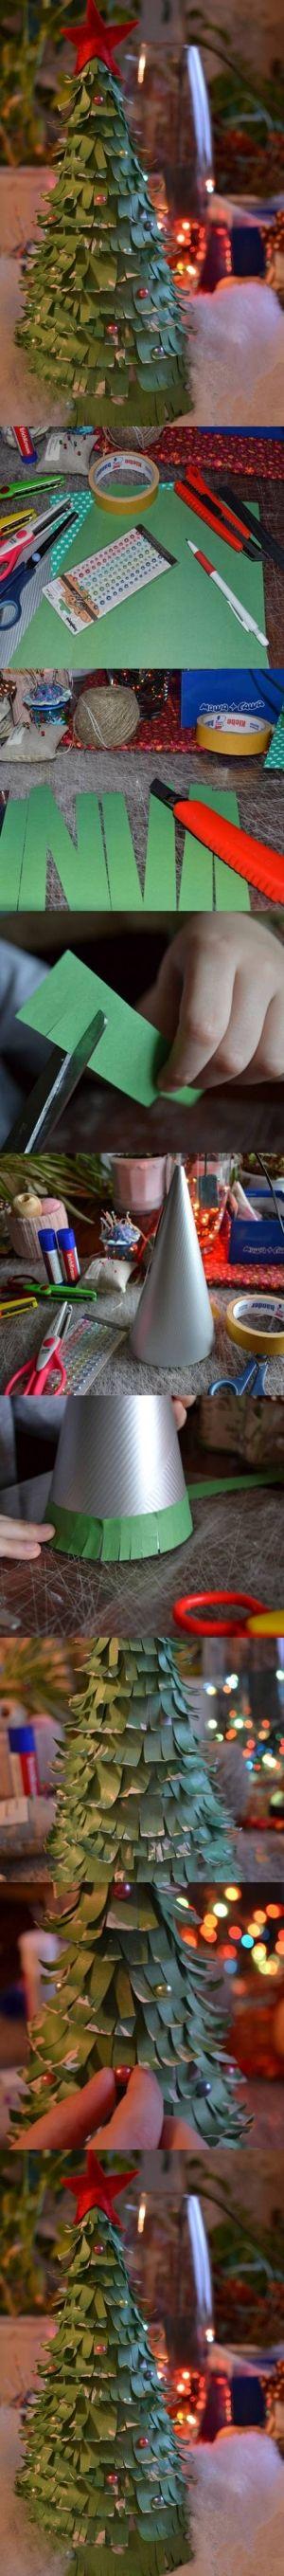 DIY Strips of Papers Christmas Tree DIY Strips of Papers Christmas Tree by diyforever